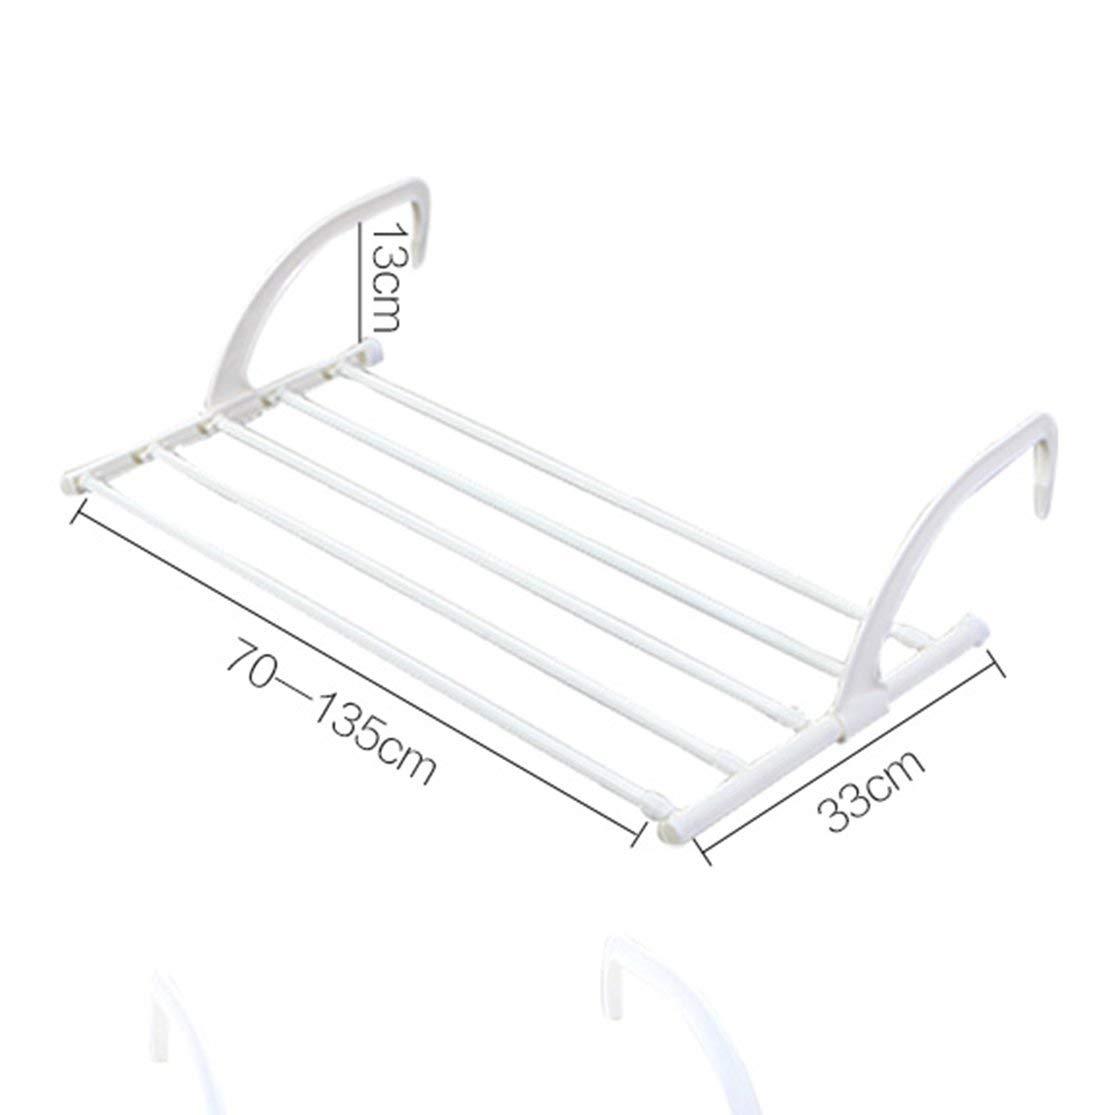 LouiseEvel215 Balc/ón Multifuncional Ropa Rack de Secado Ropa Interior retr/áctil al Aire Libre Percha Poste Plegable Estante de Secado